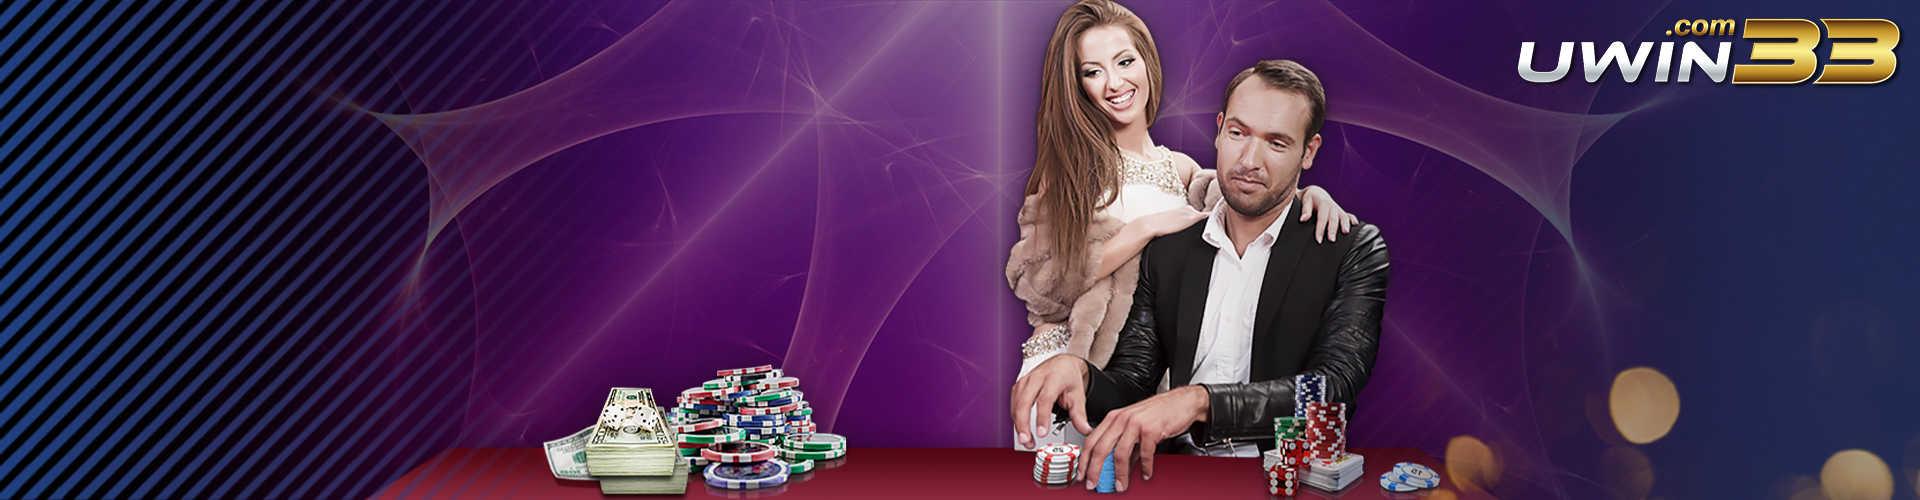 Betting Online with UWin33